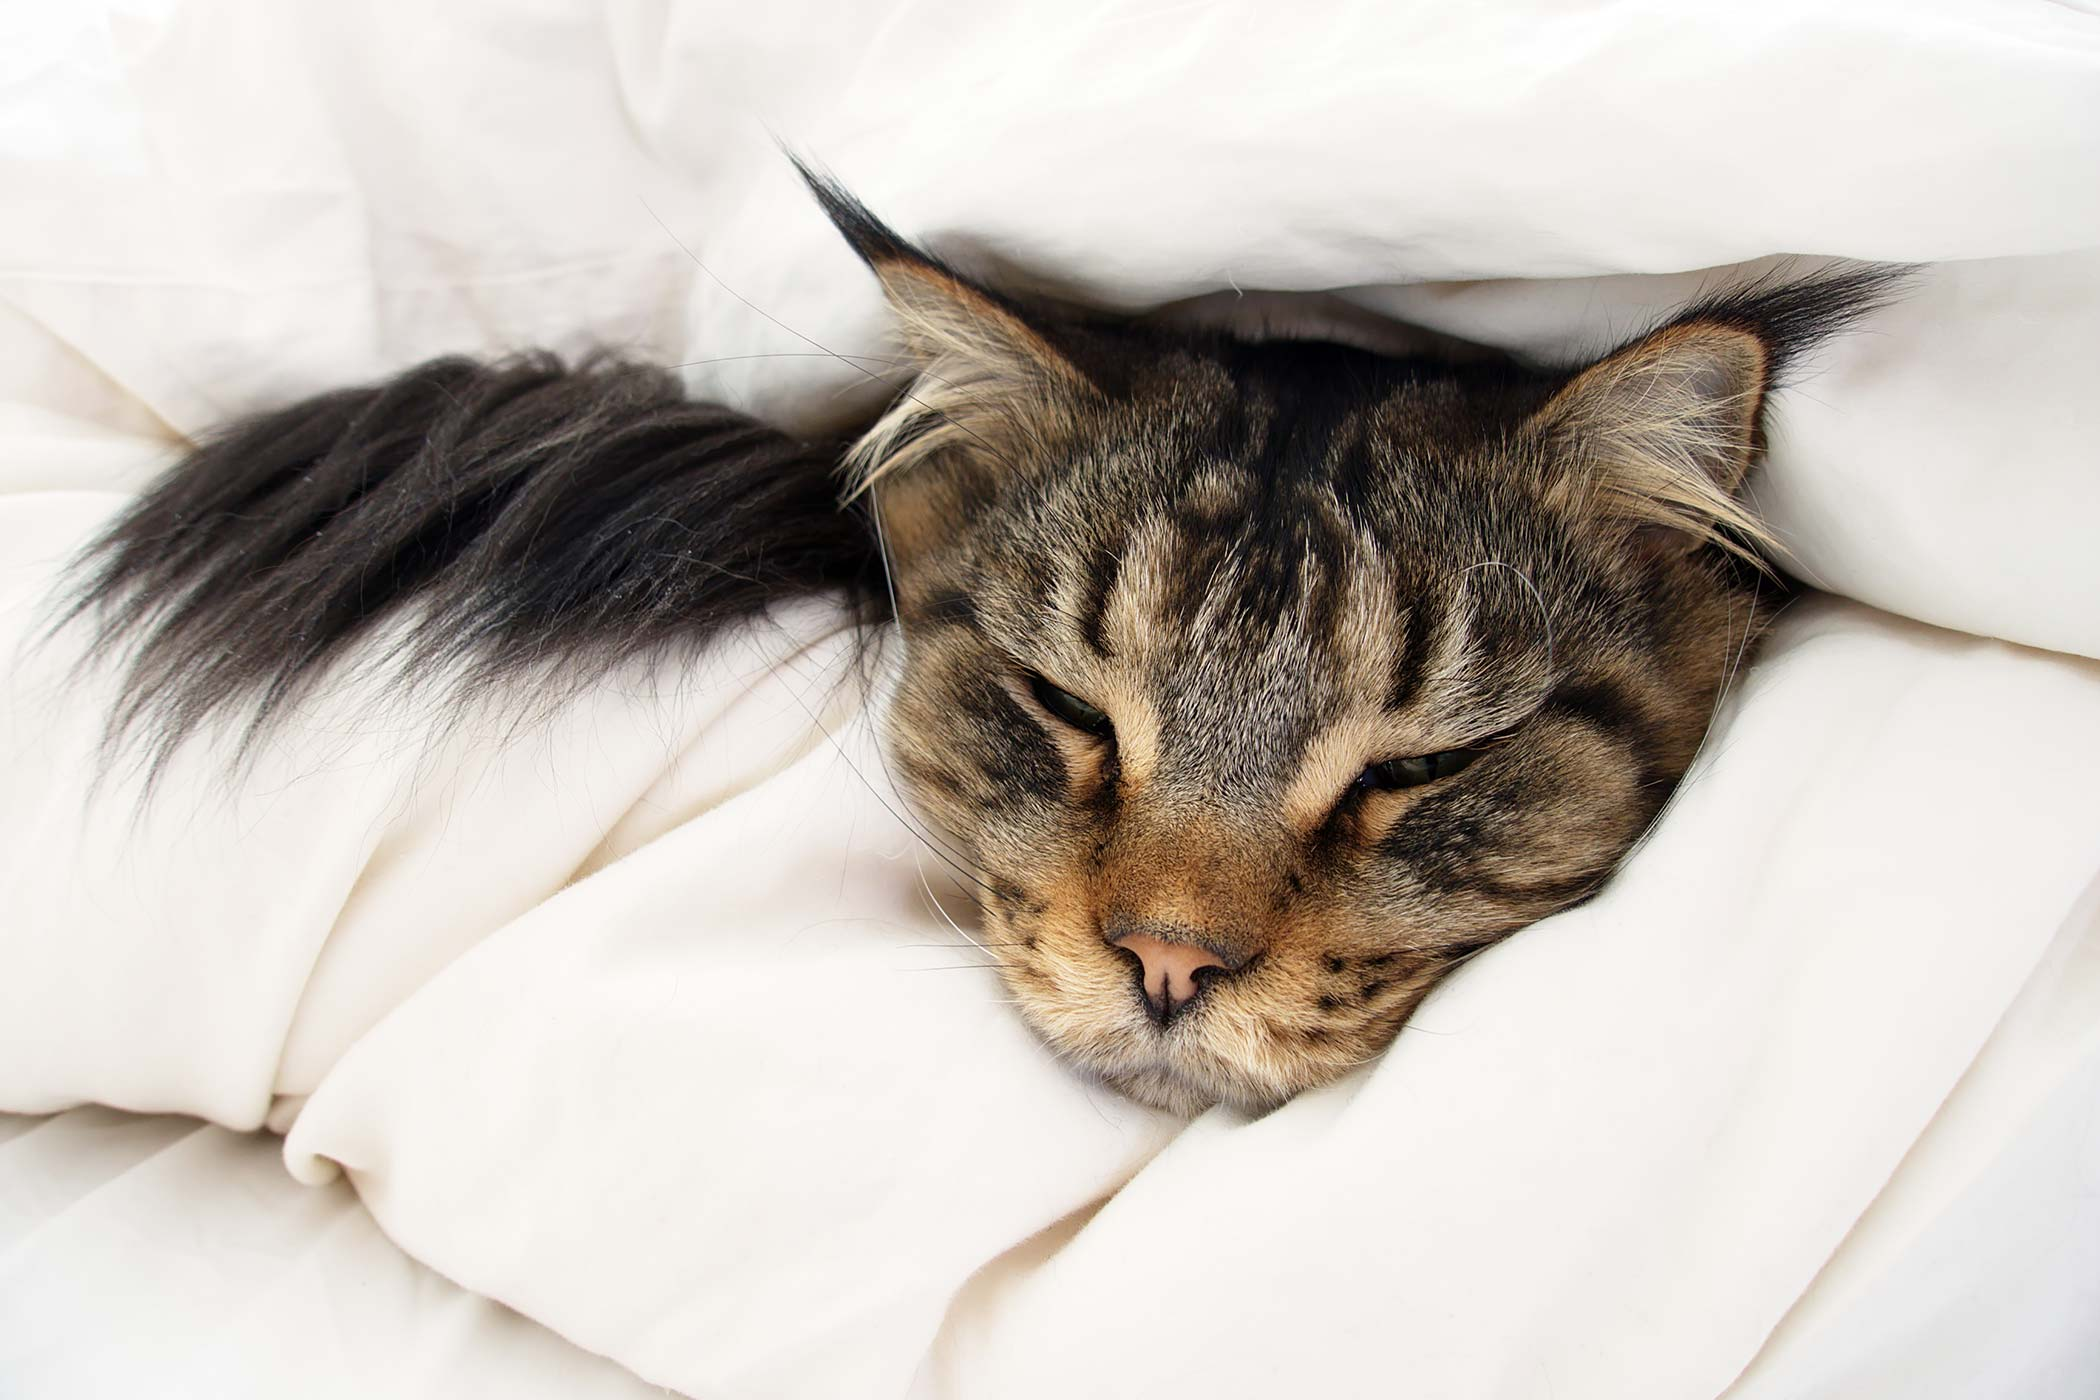 Epileptic Seizures in Cats